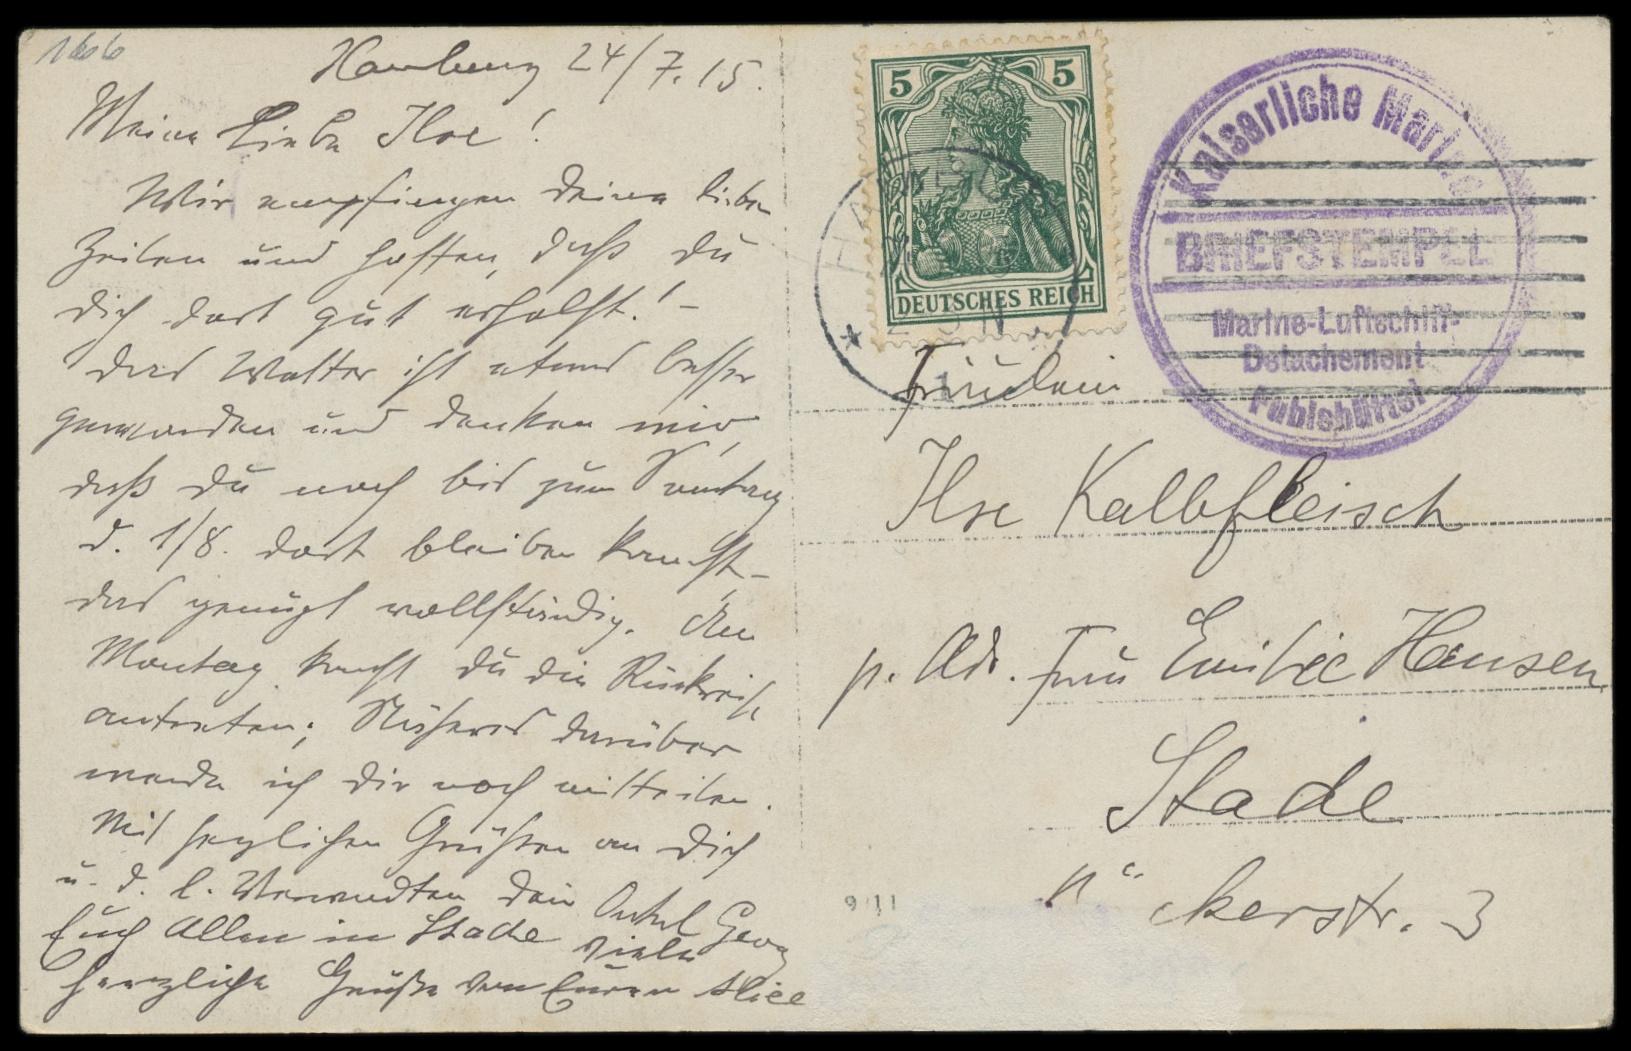 Lot 1866 - Flug- und Zeppelinpost zeppelinpost -  Peter Harlos Auctions 42. Harlos Auktion